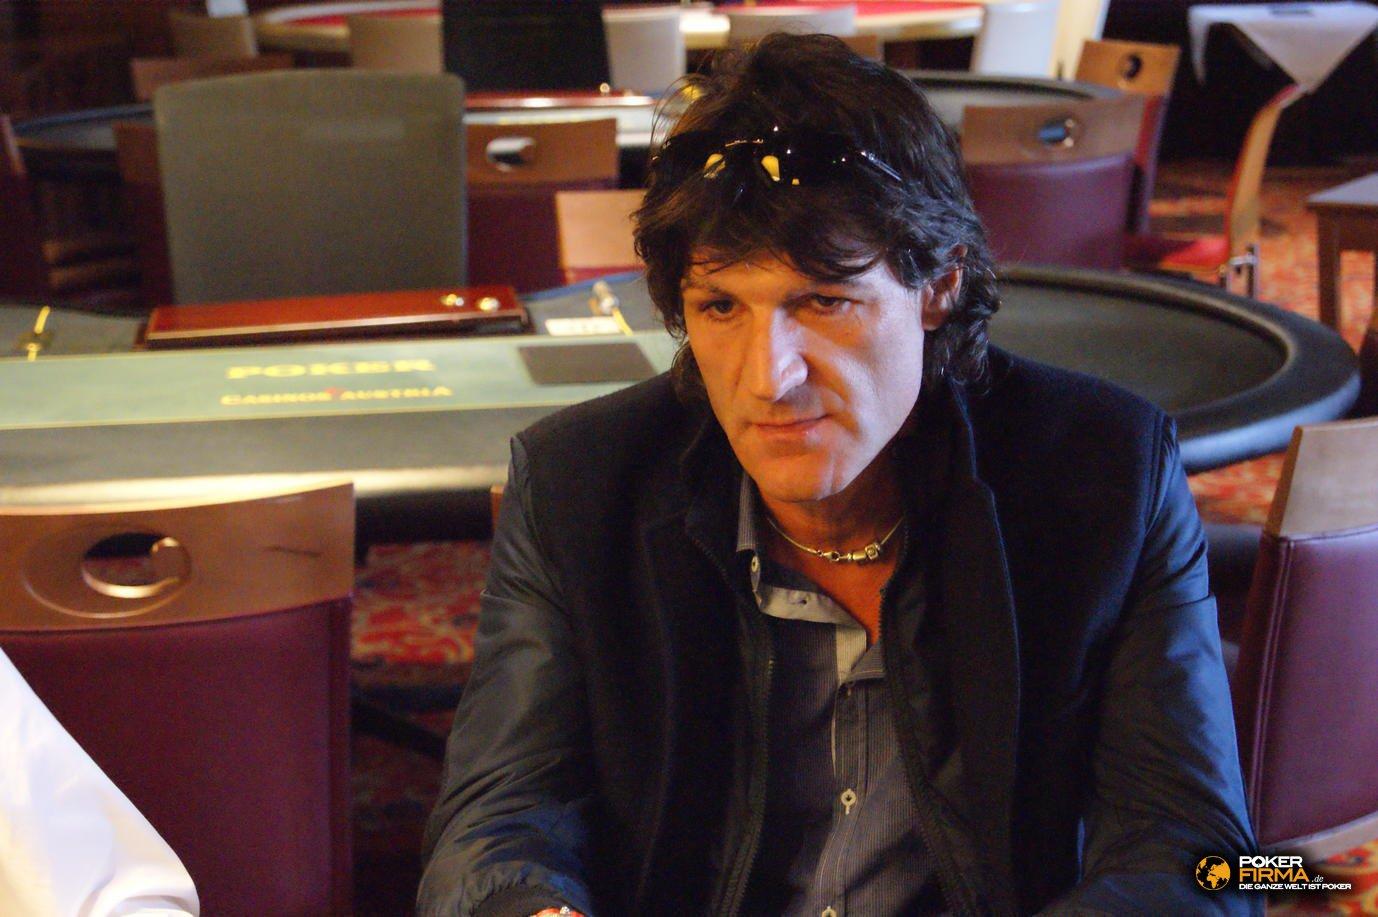 Mountain_Poker_Party_1500_NLH_081011_Paolo_Ossanna